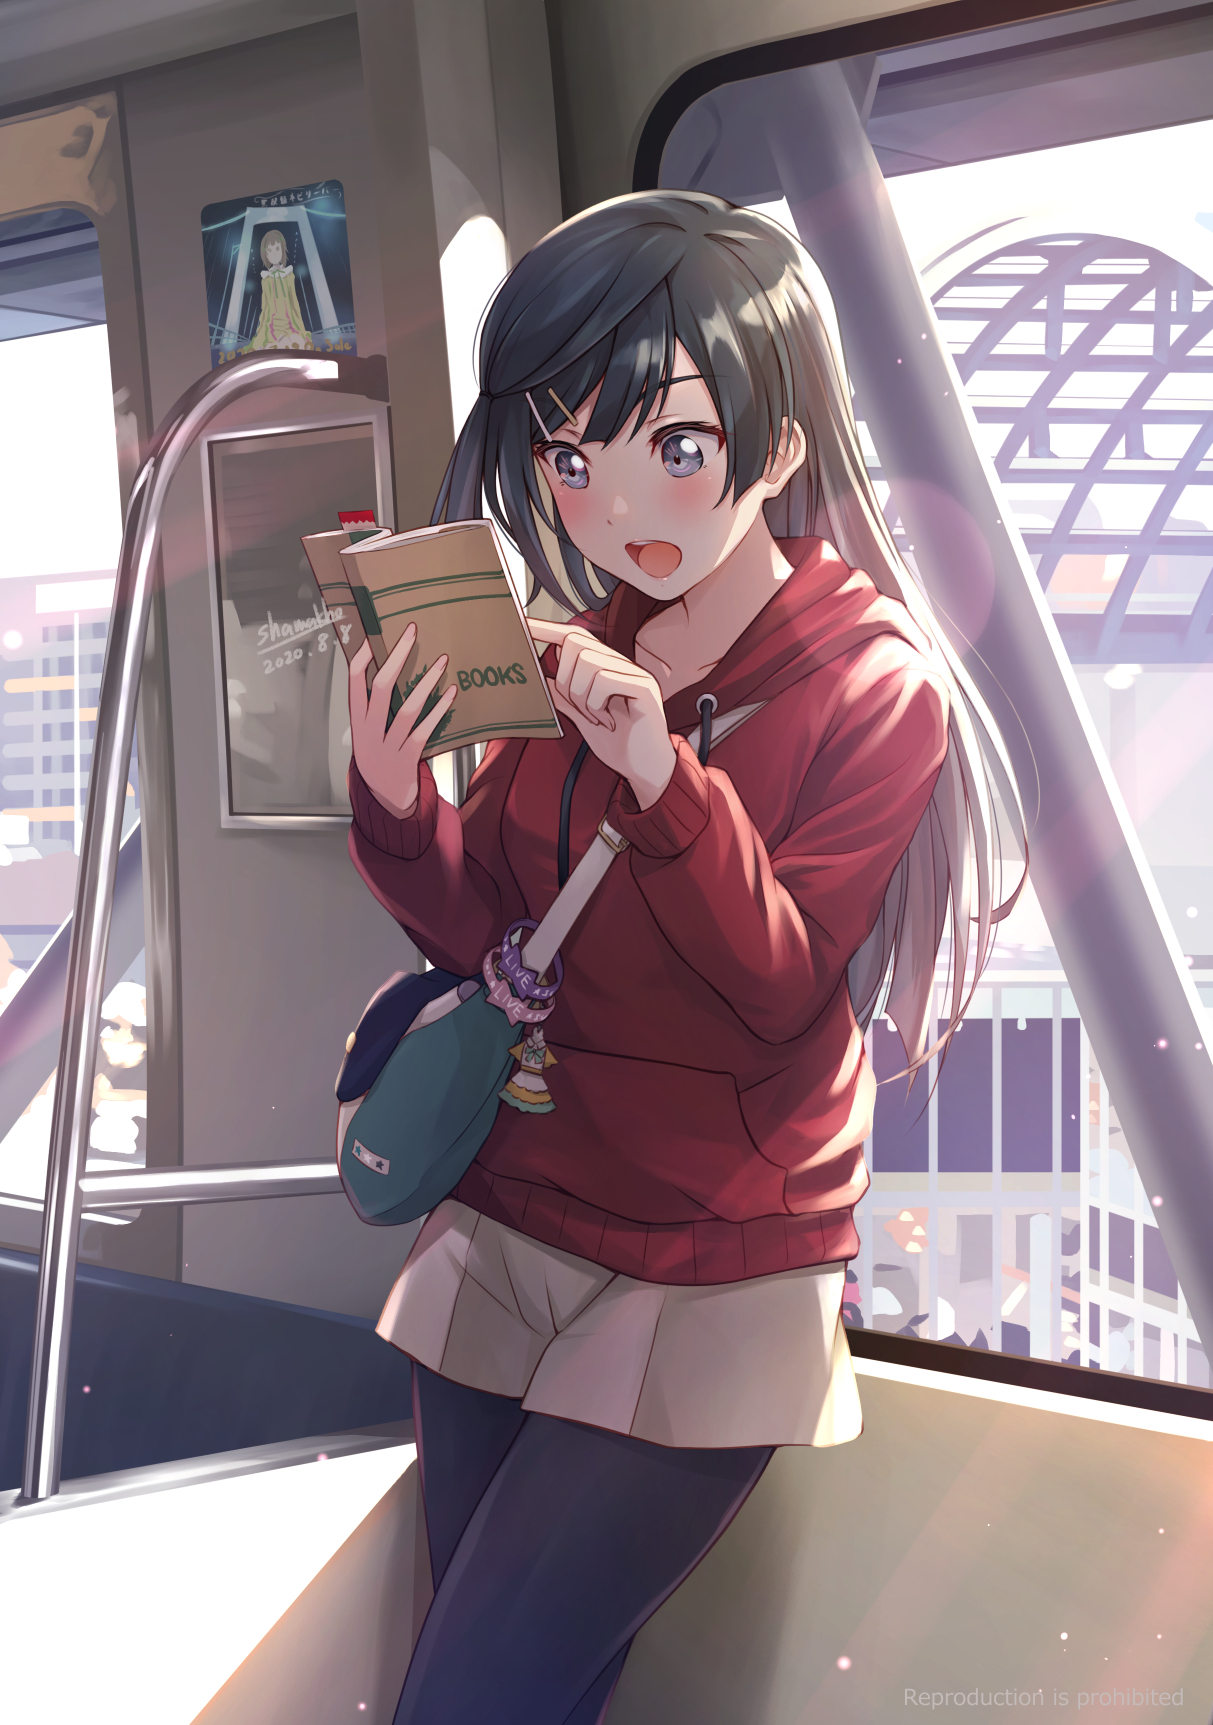 Setsuna reading on the train [Love Live! Nijigasaki High School Idol Club]